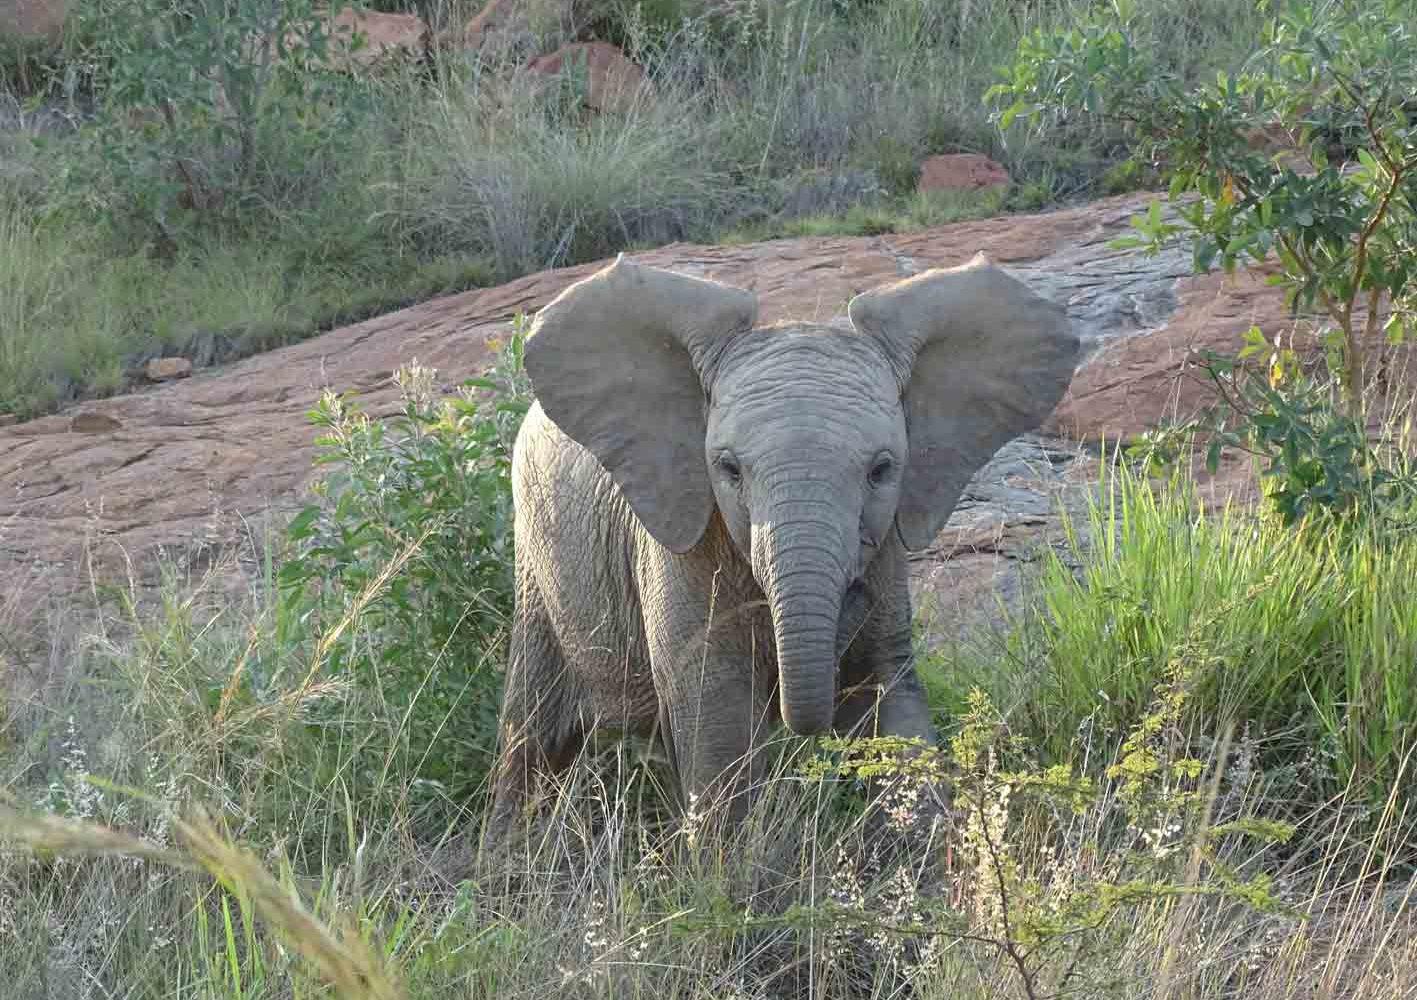 Junger Elefant im Krüger-Nationalpark, Südafrika